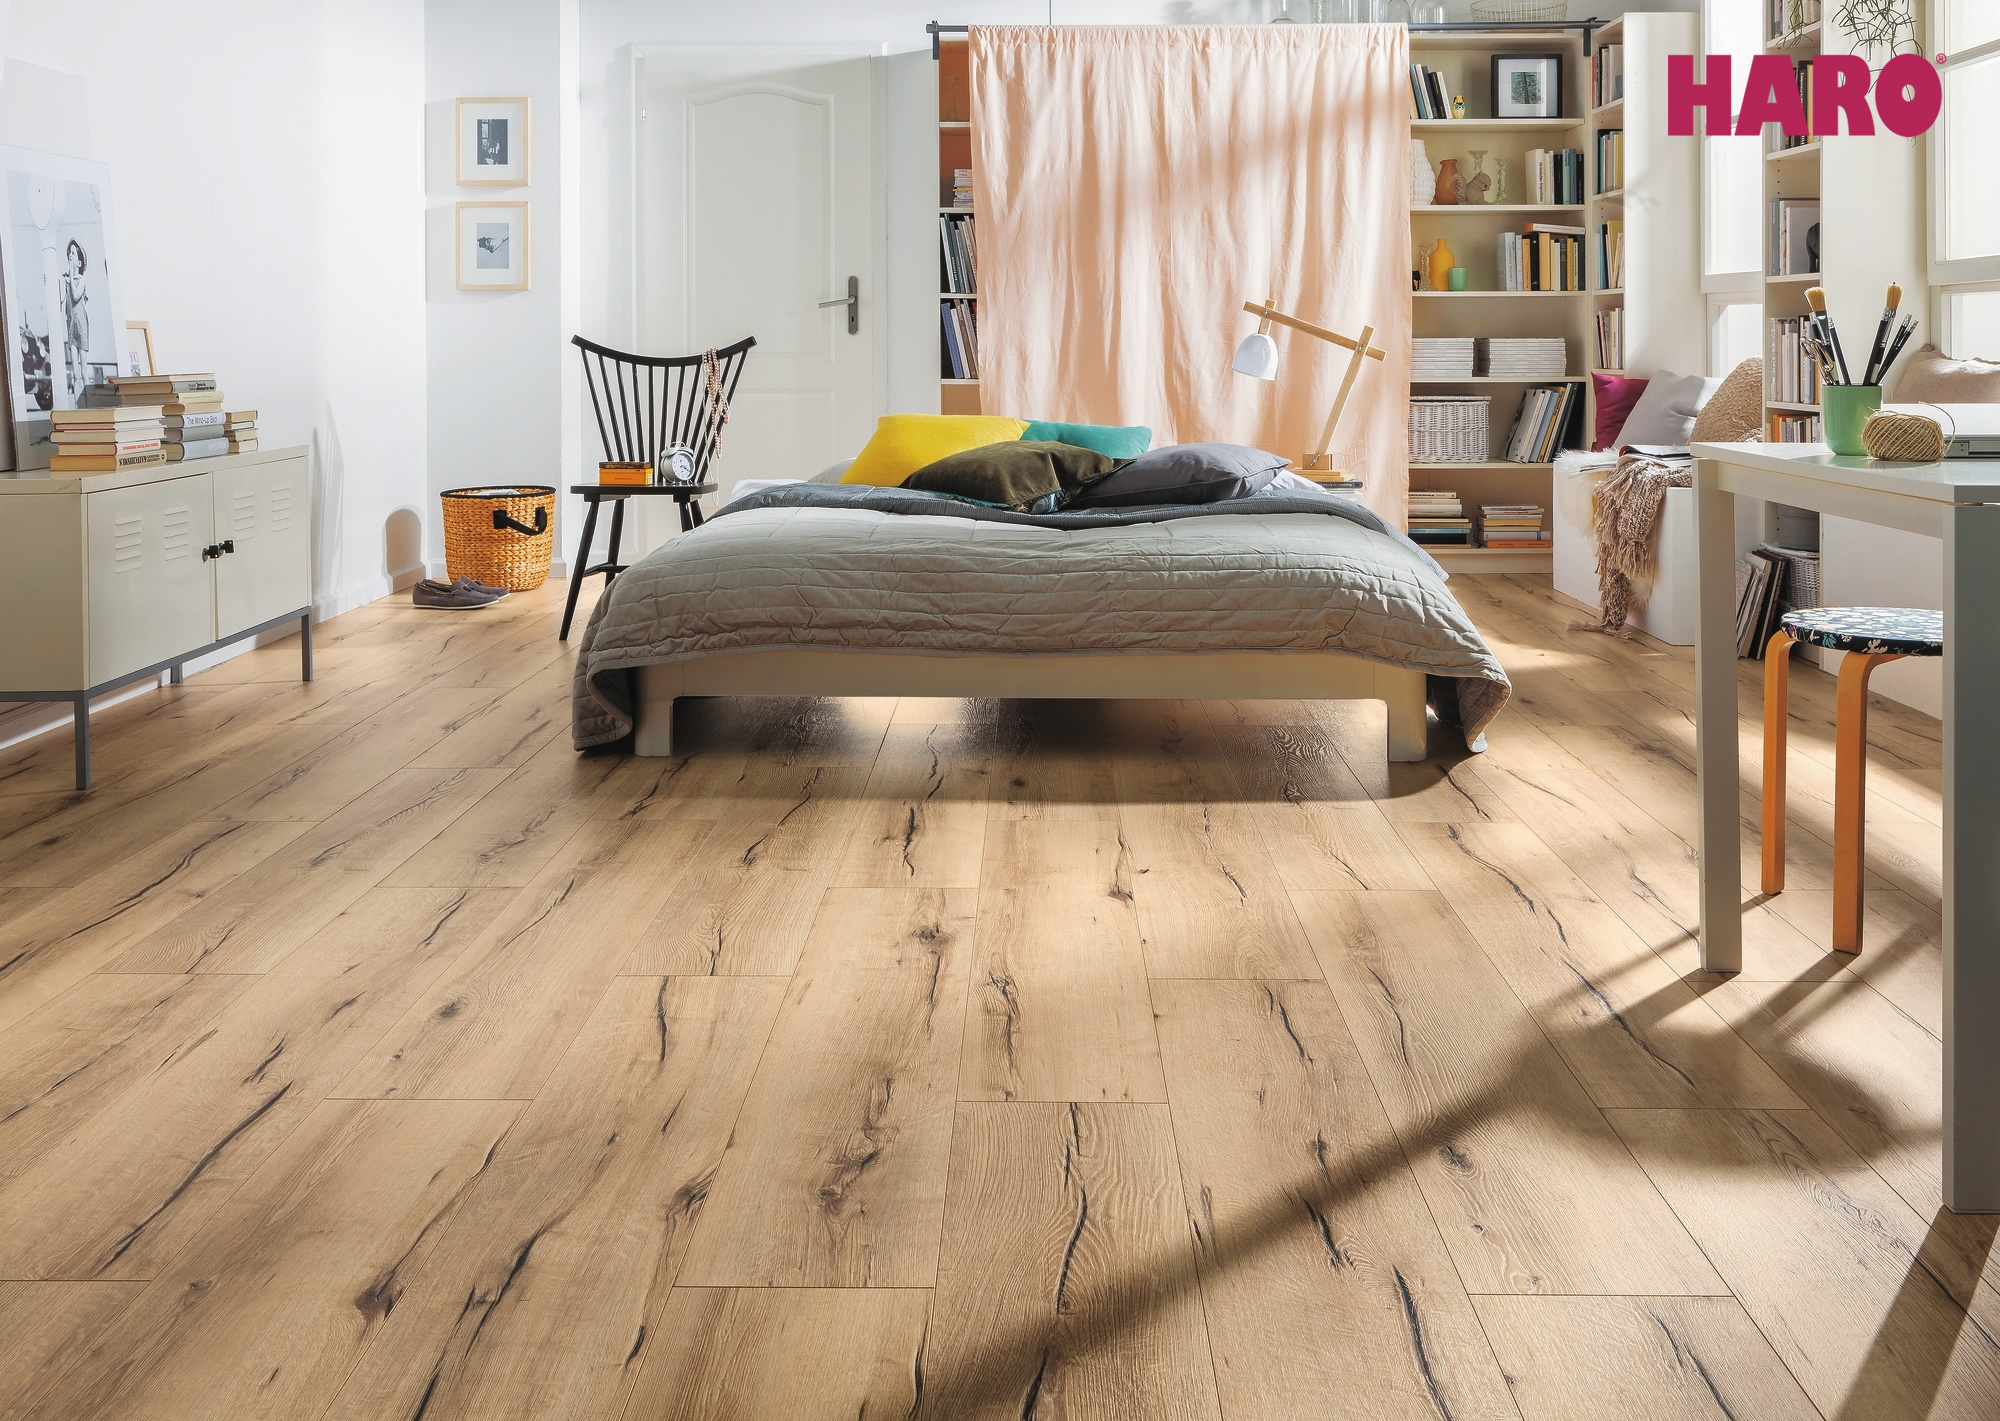 532060 haro laminat tritty 100 campus 4v eiche italica. Black Bedroom Furniture Sets. Home Design Ideas